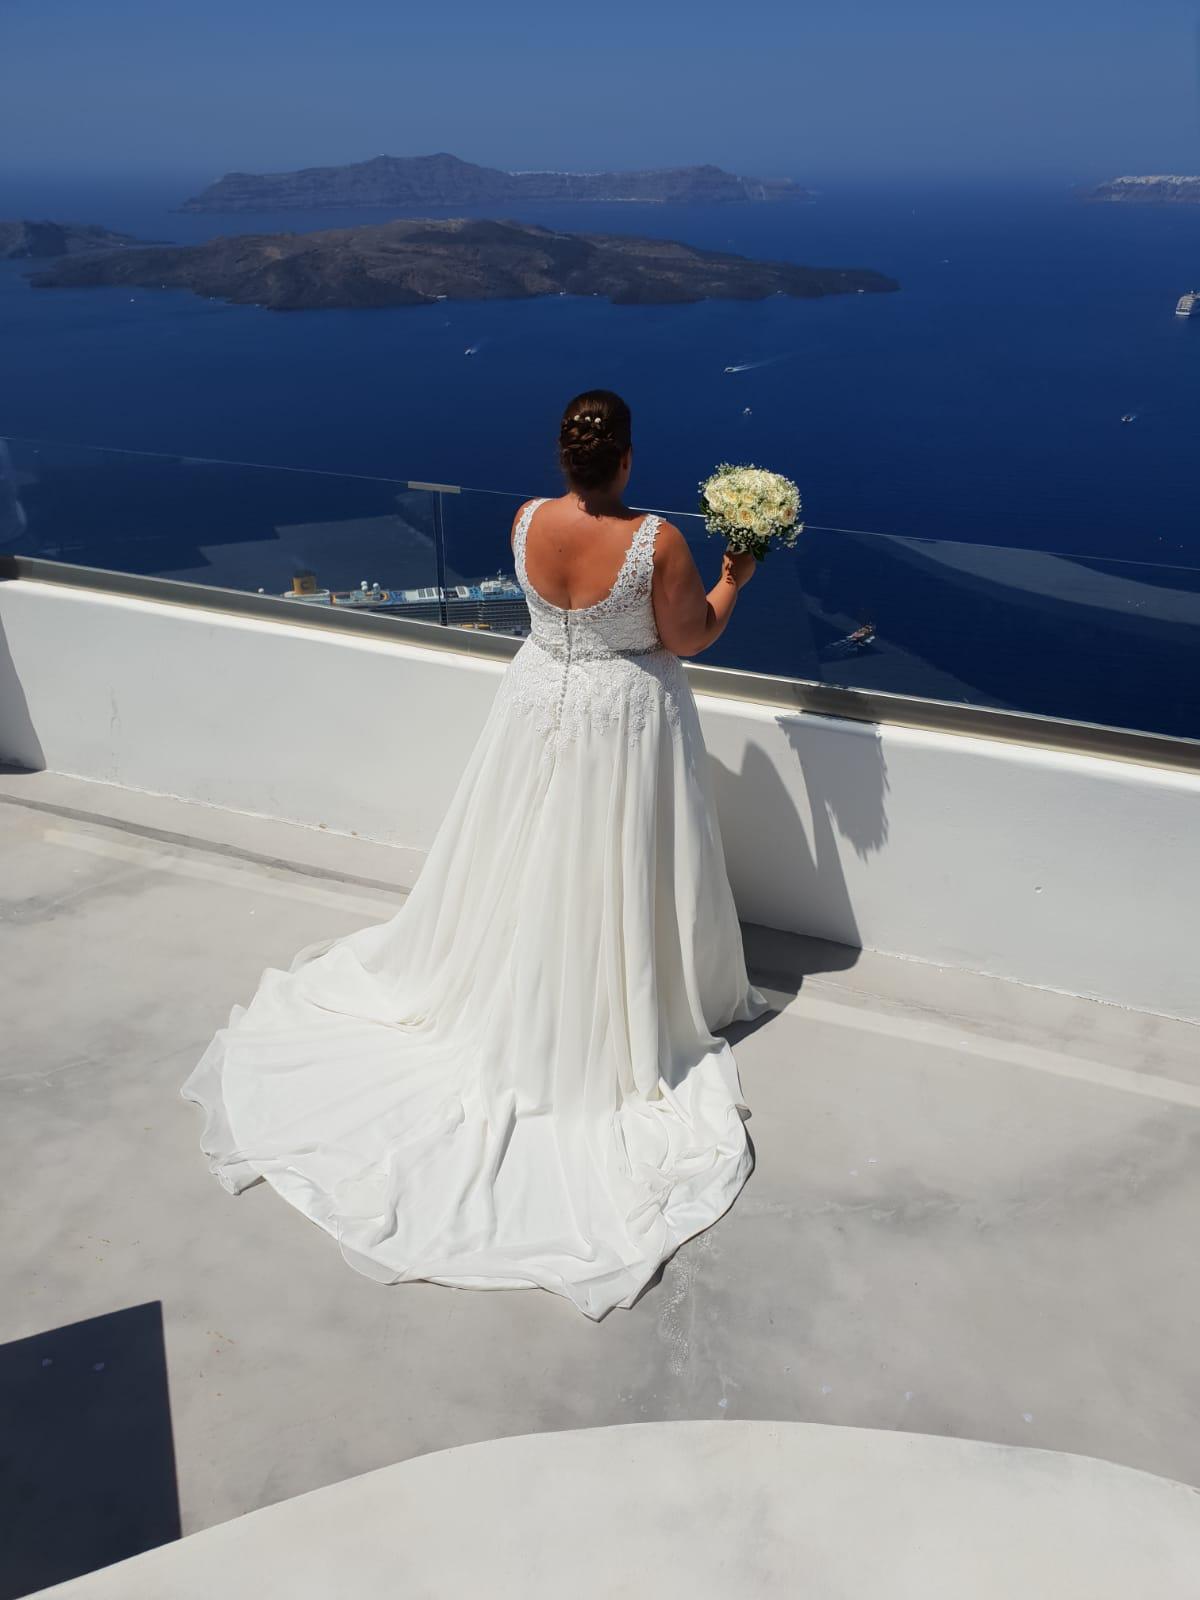 Leanne Holland in Santorini